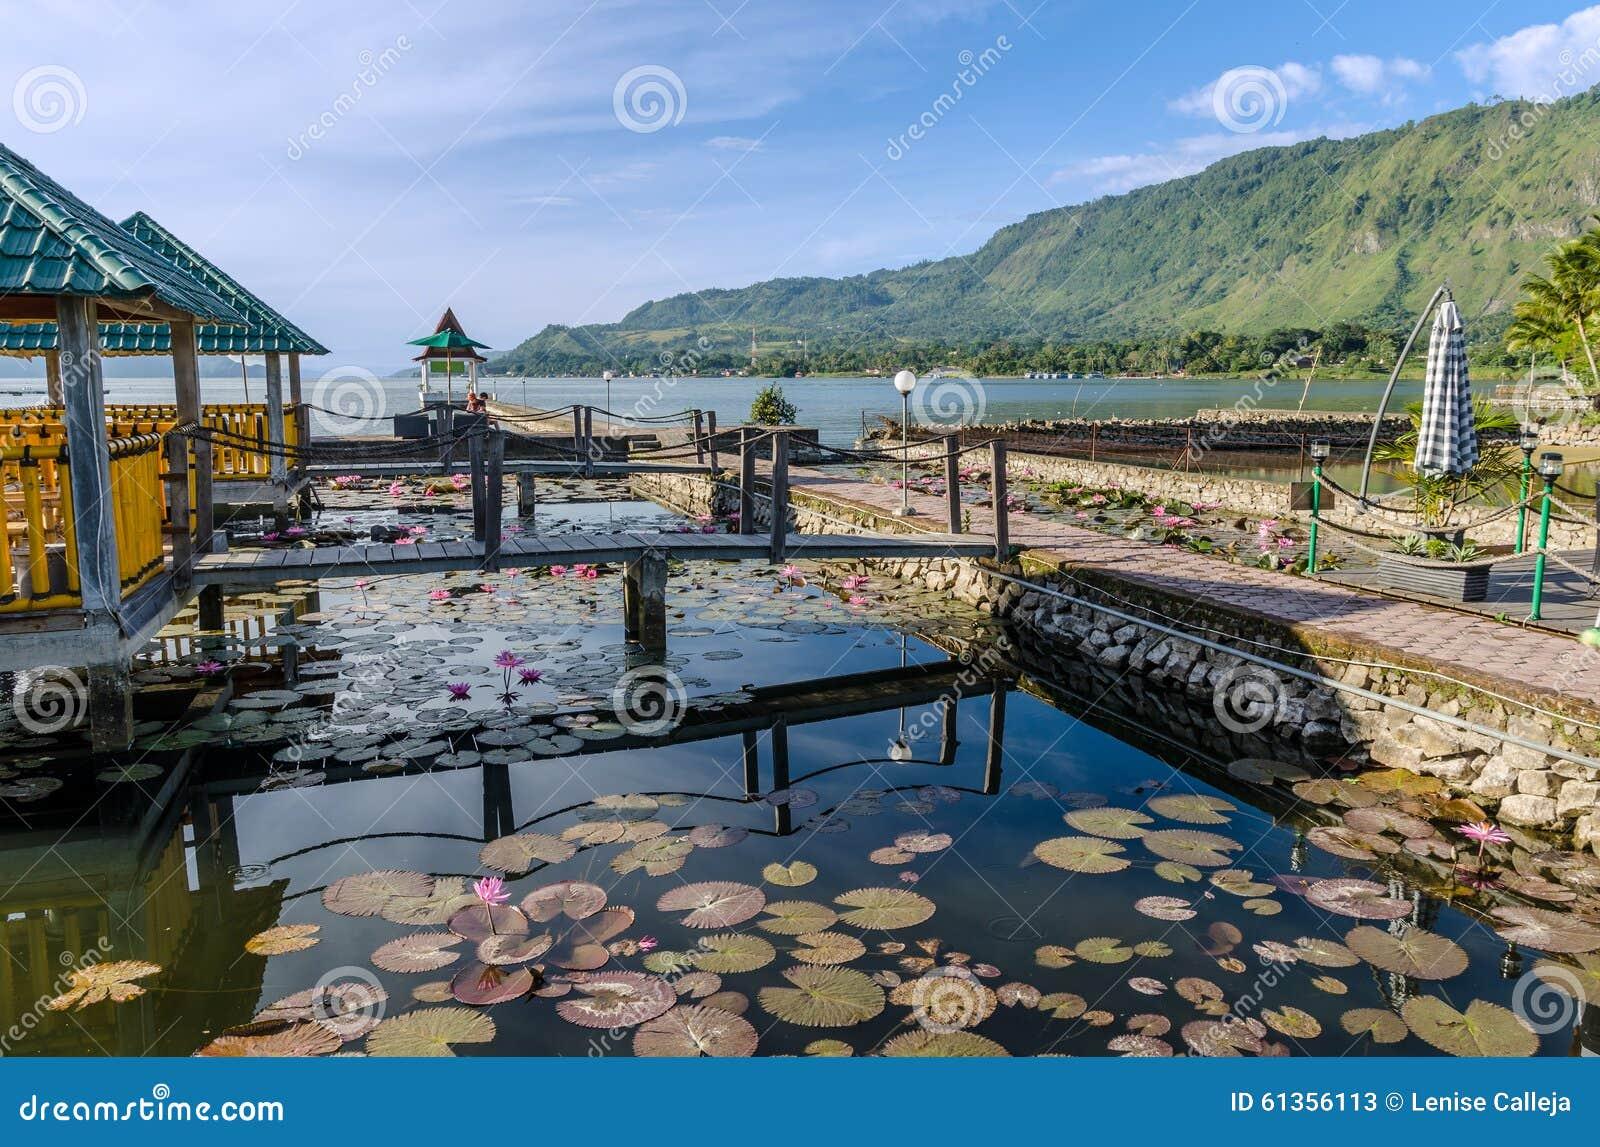 Samosir Island In Lake Toba, Sumatra Indonesia Stock Image - Image